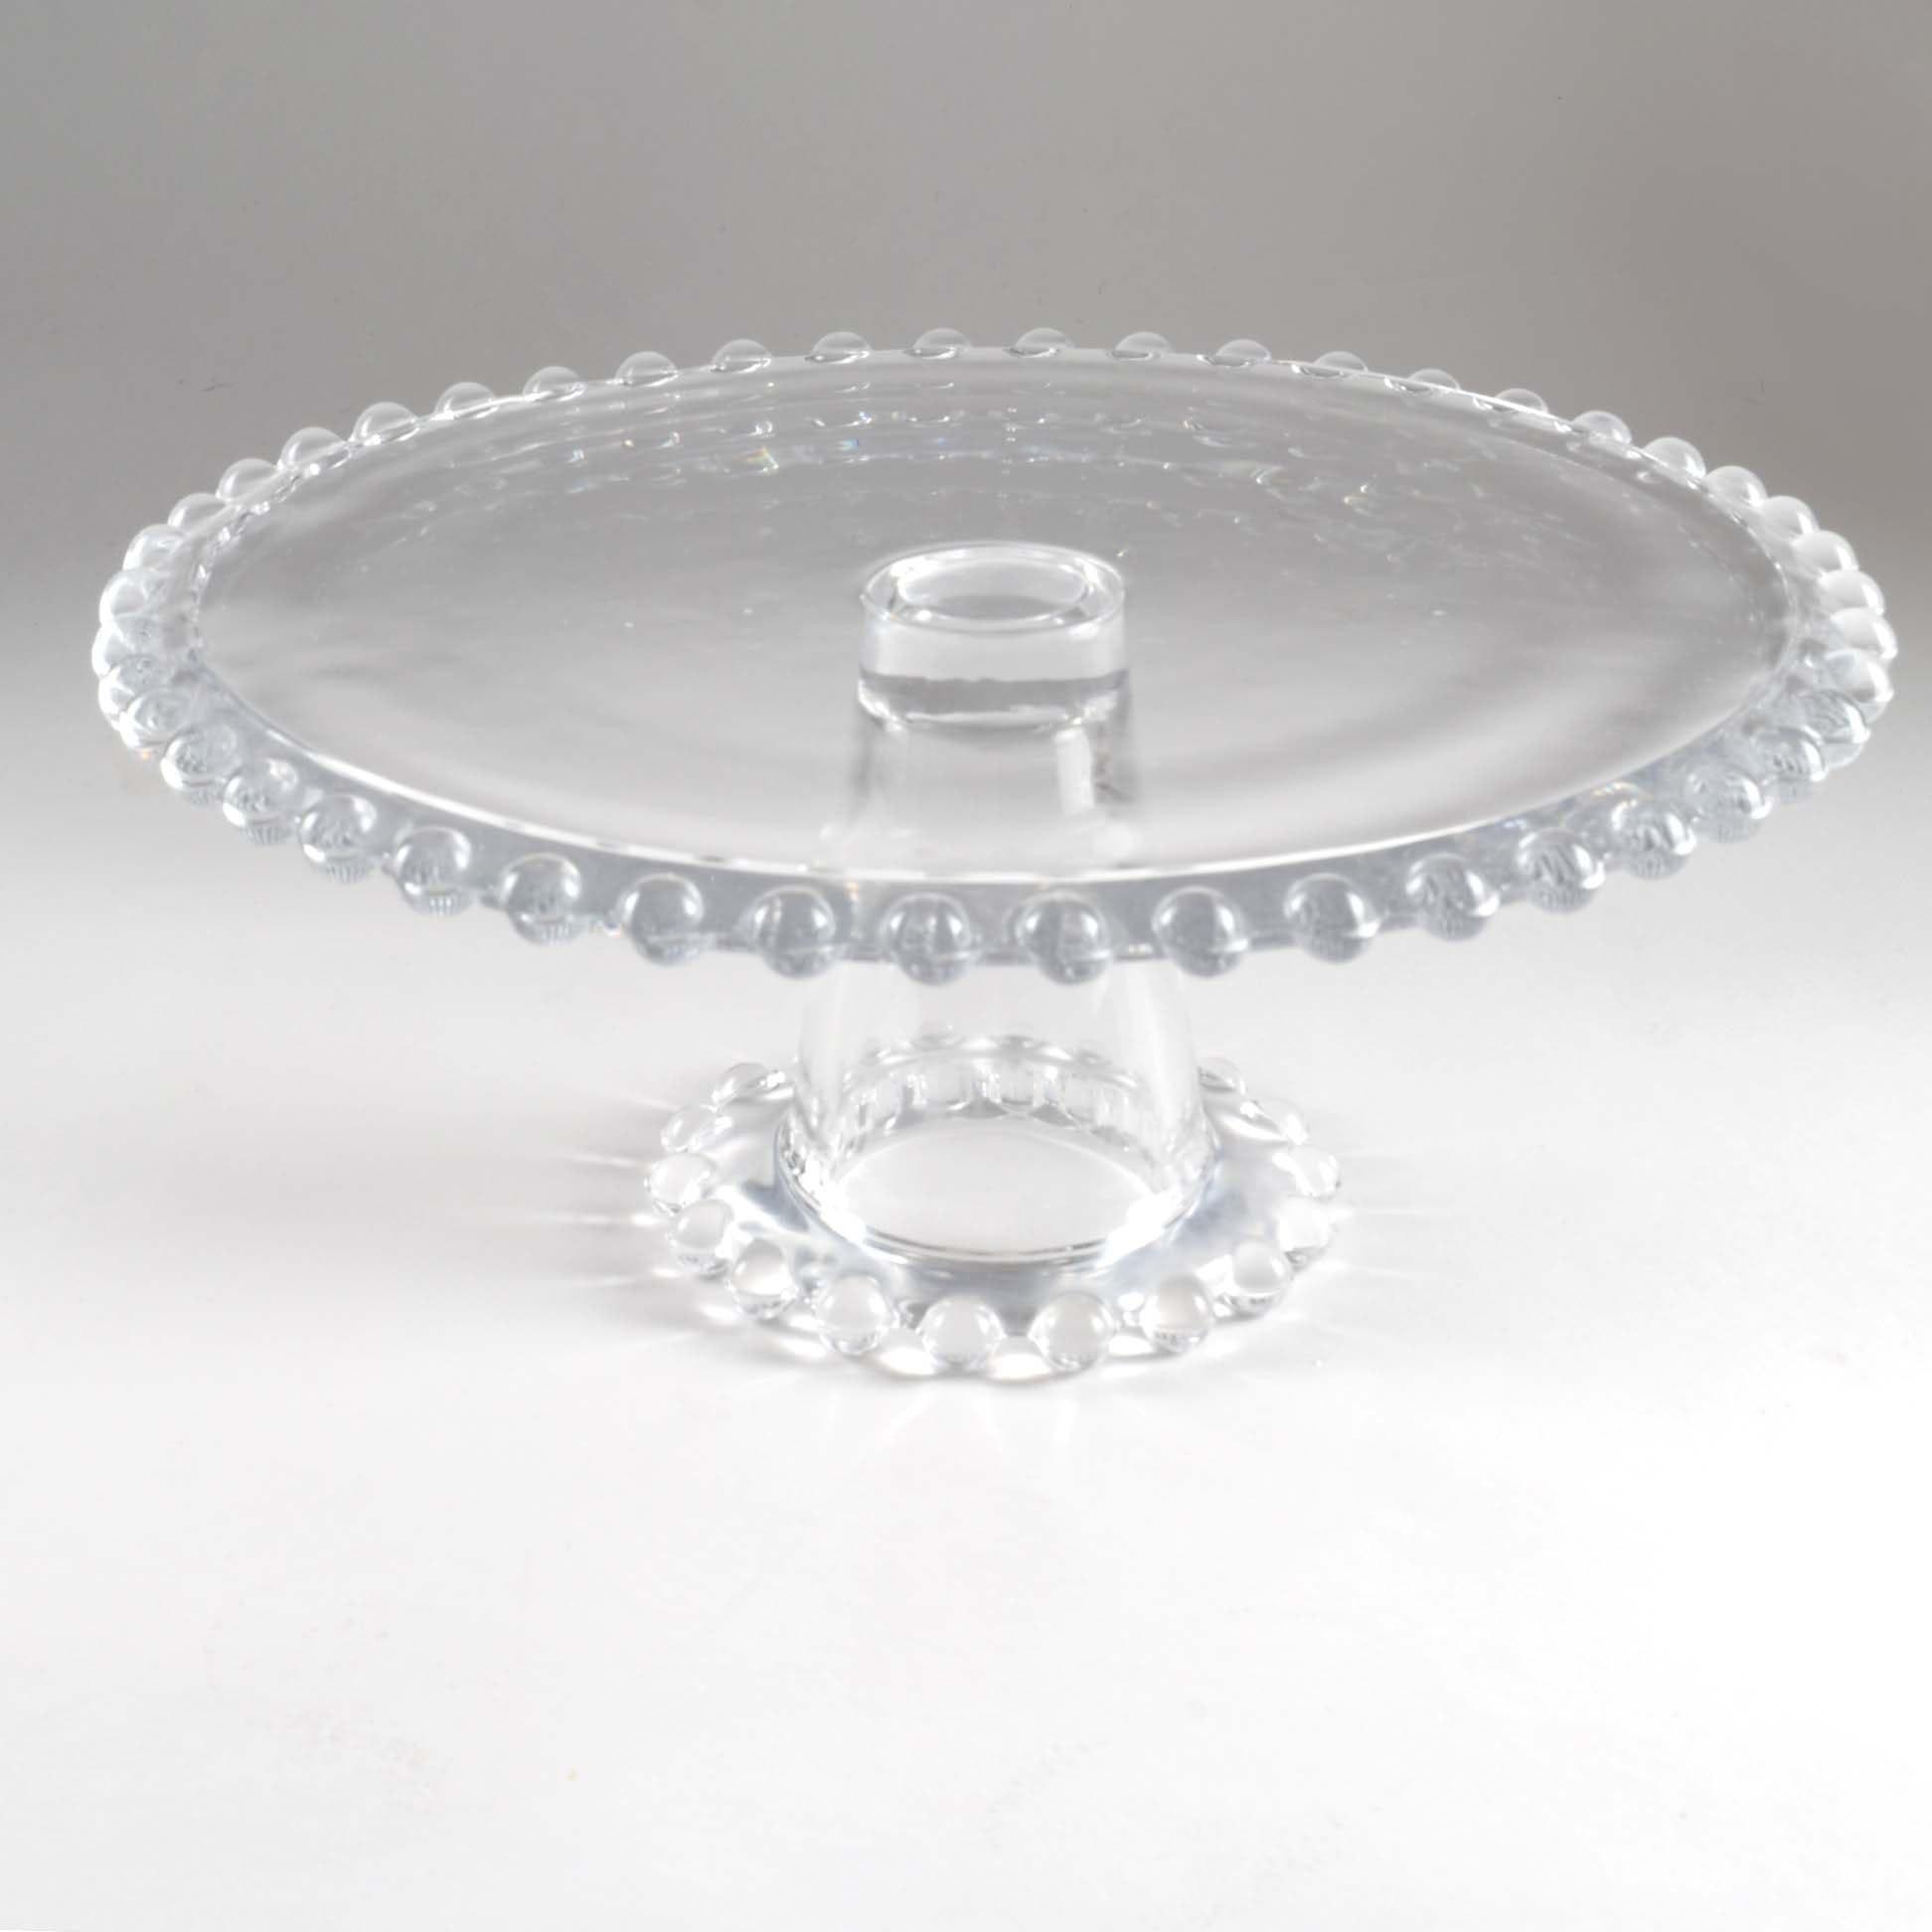 Vintage Candlewick Glass Cake Stand ... & Vintage Candlewick Glass Cake Stand : EBTH